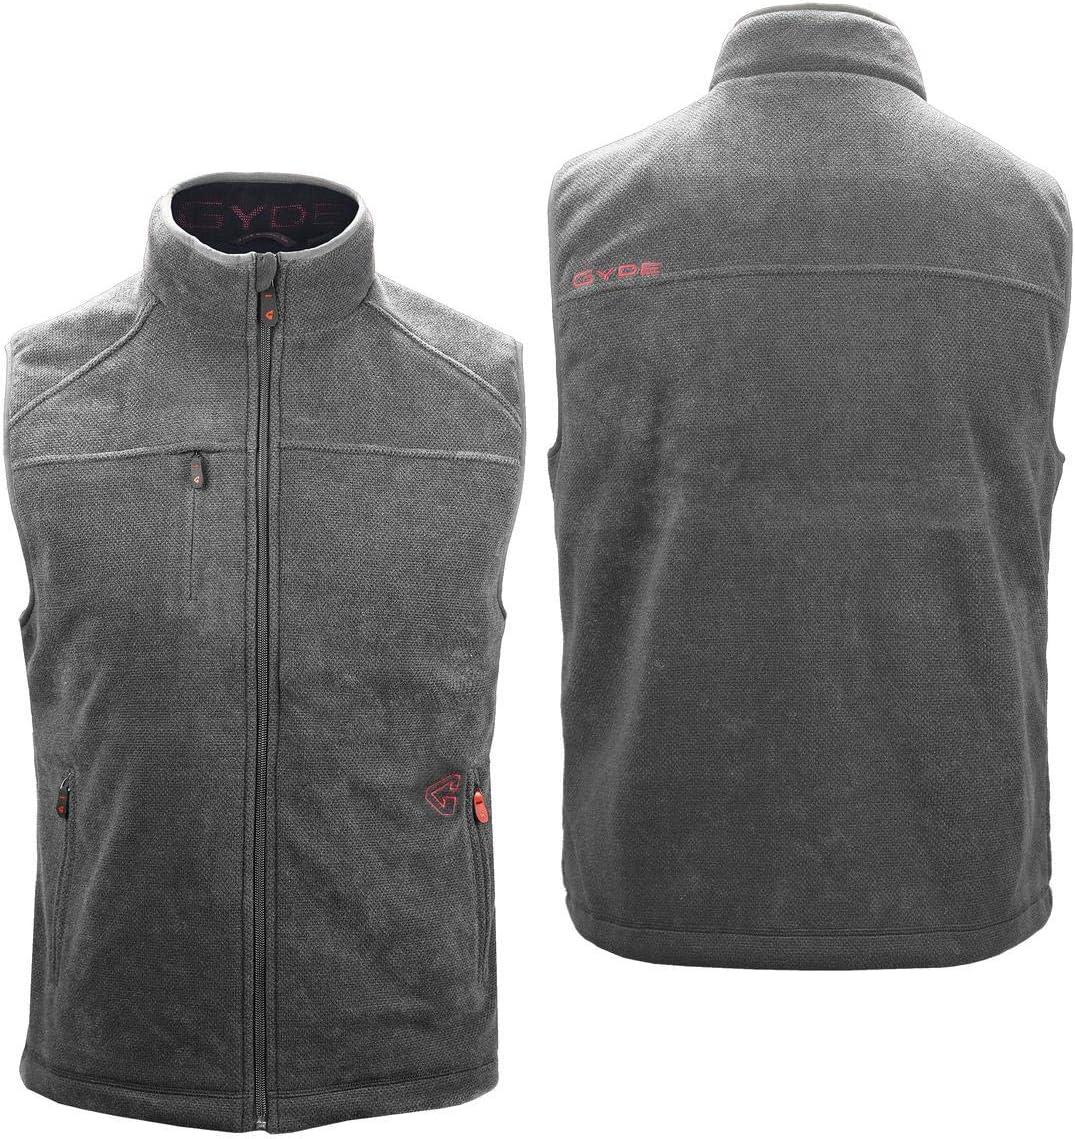 7V Battery Gerbing Gyde Thermite Fleece Heated Vest for Men Grey